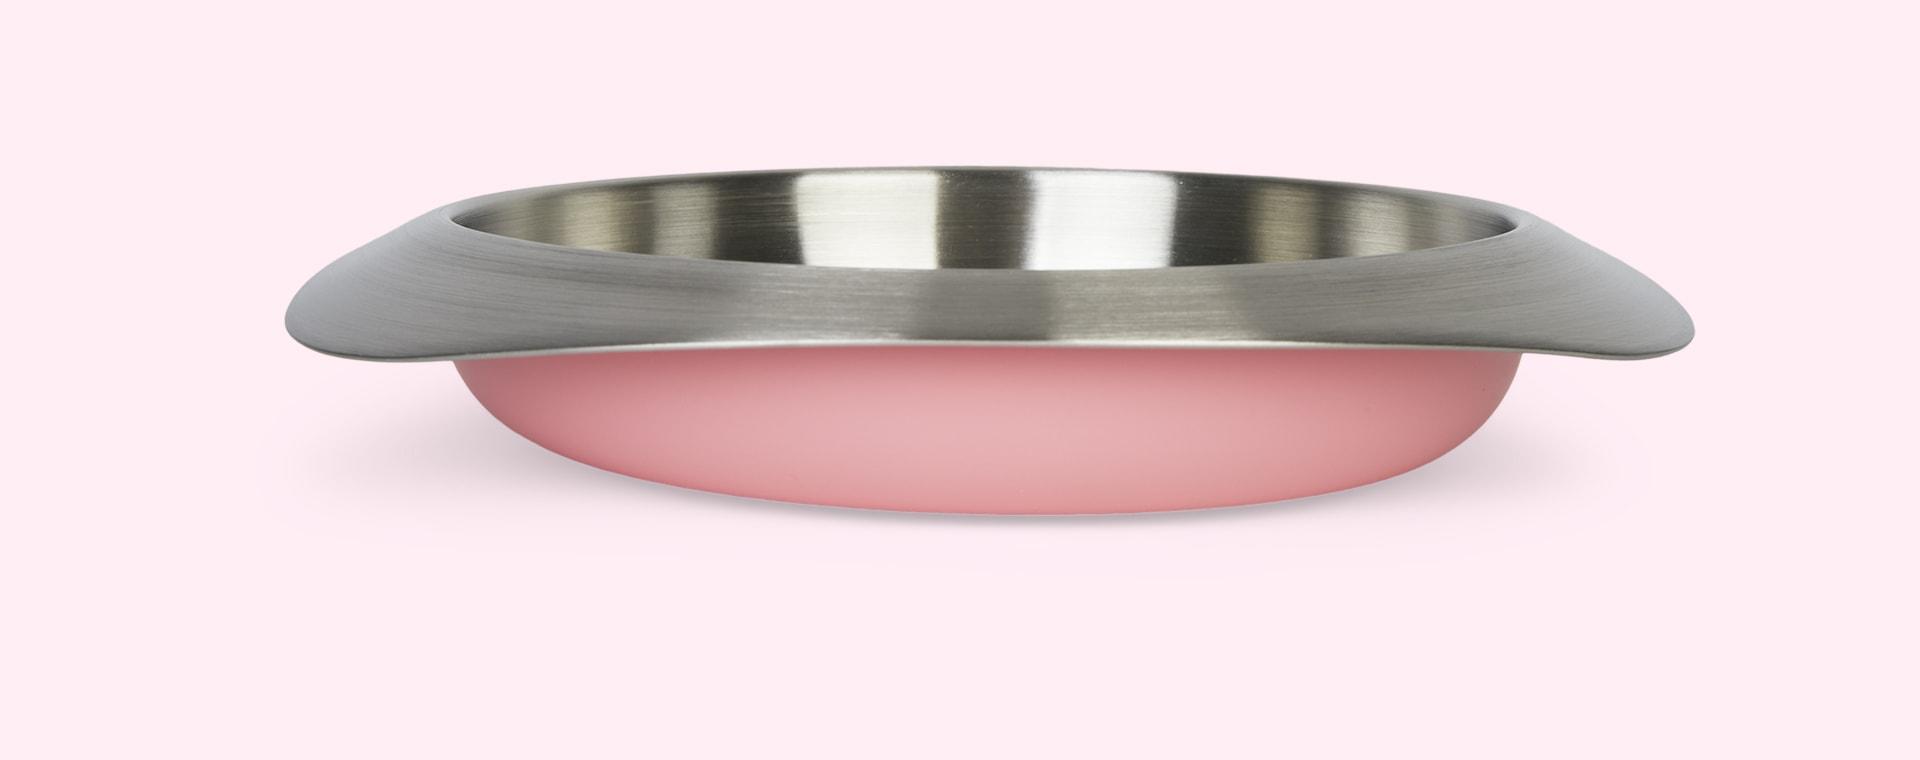 Taffy Pink VIIDA Soufflé Antibacterial Stainless Steel Plate